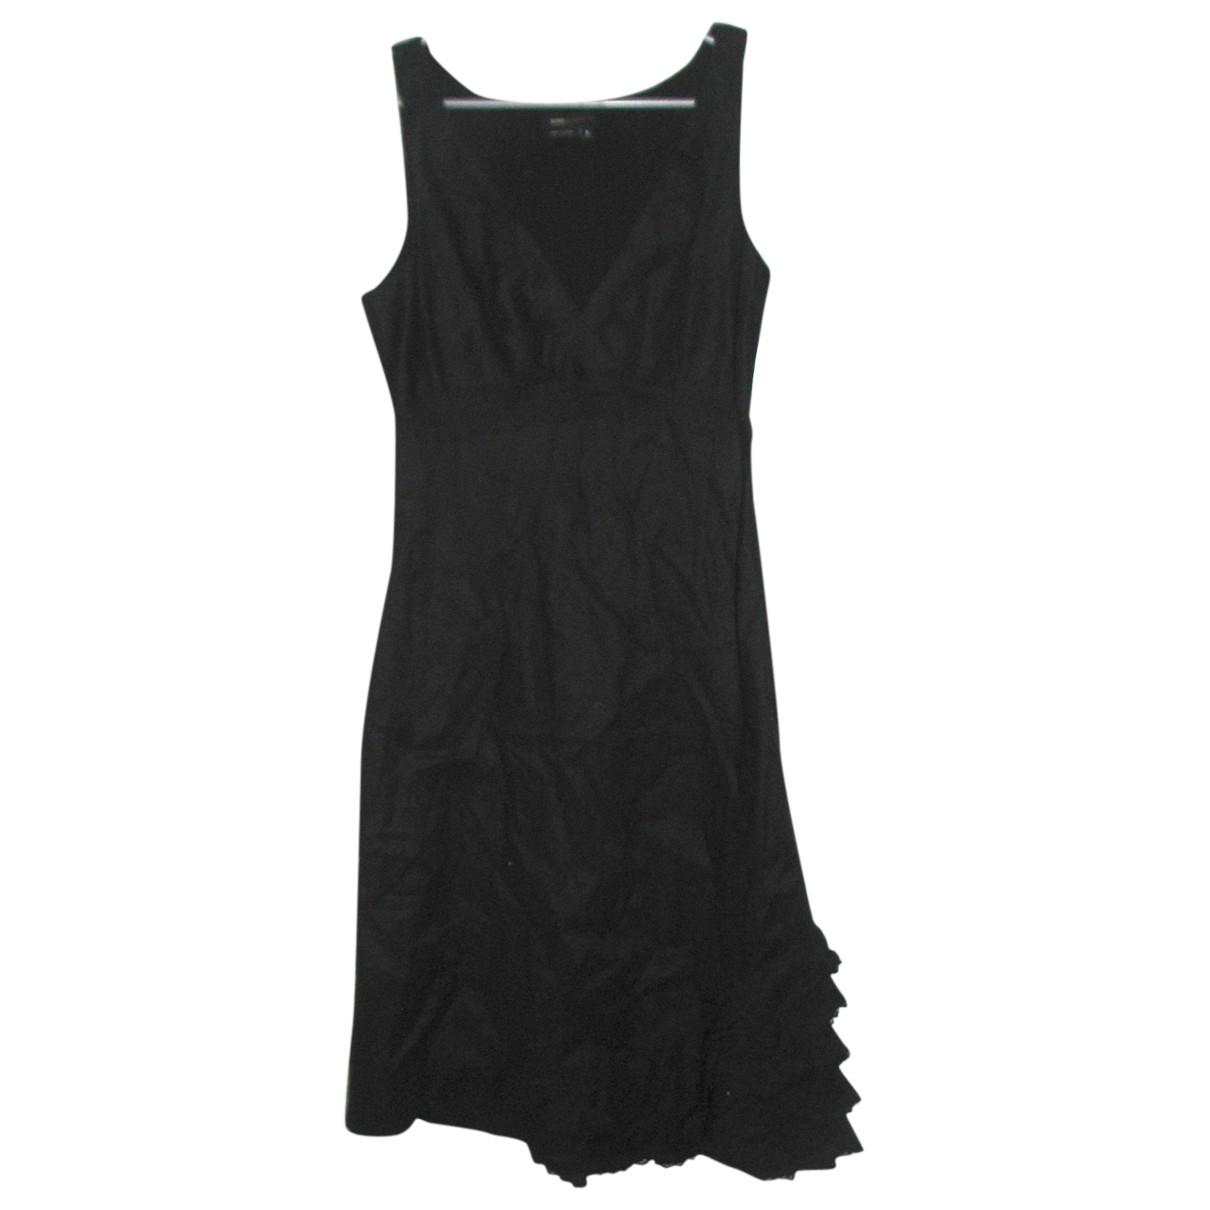 Bcbg Max Azria - Robe   pour femme en lin - noir